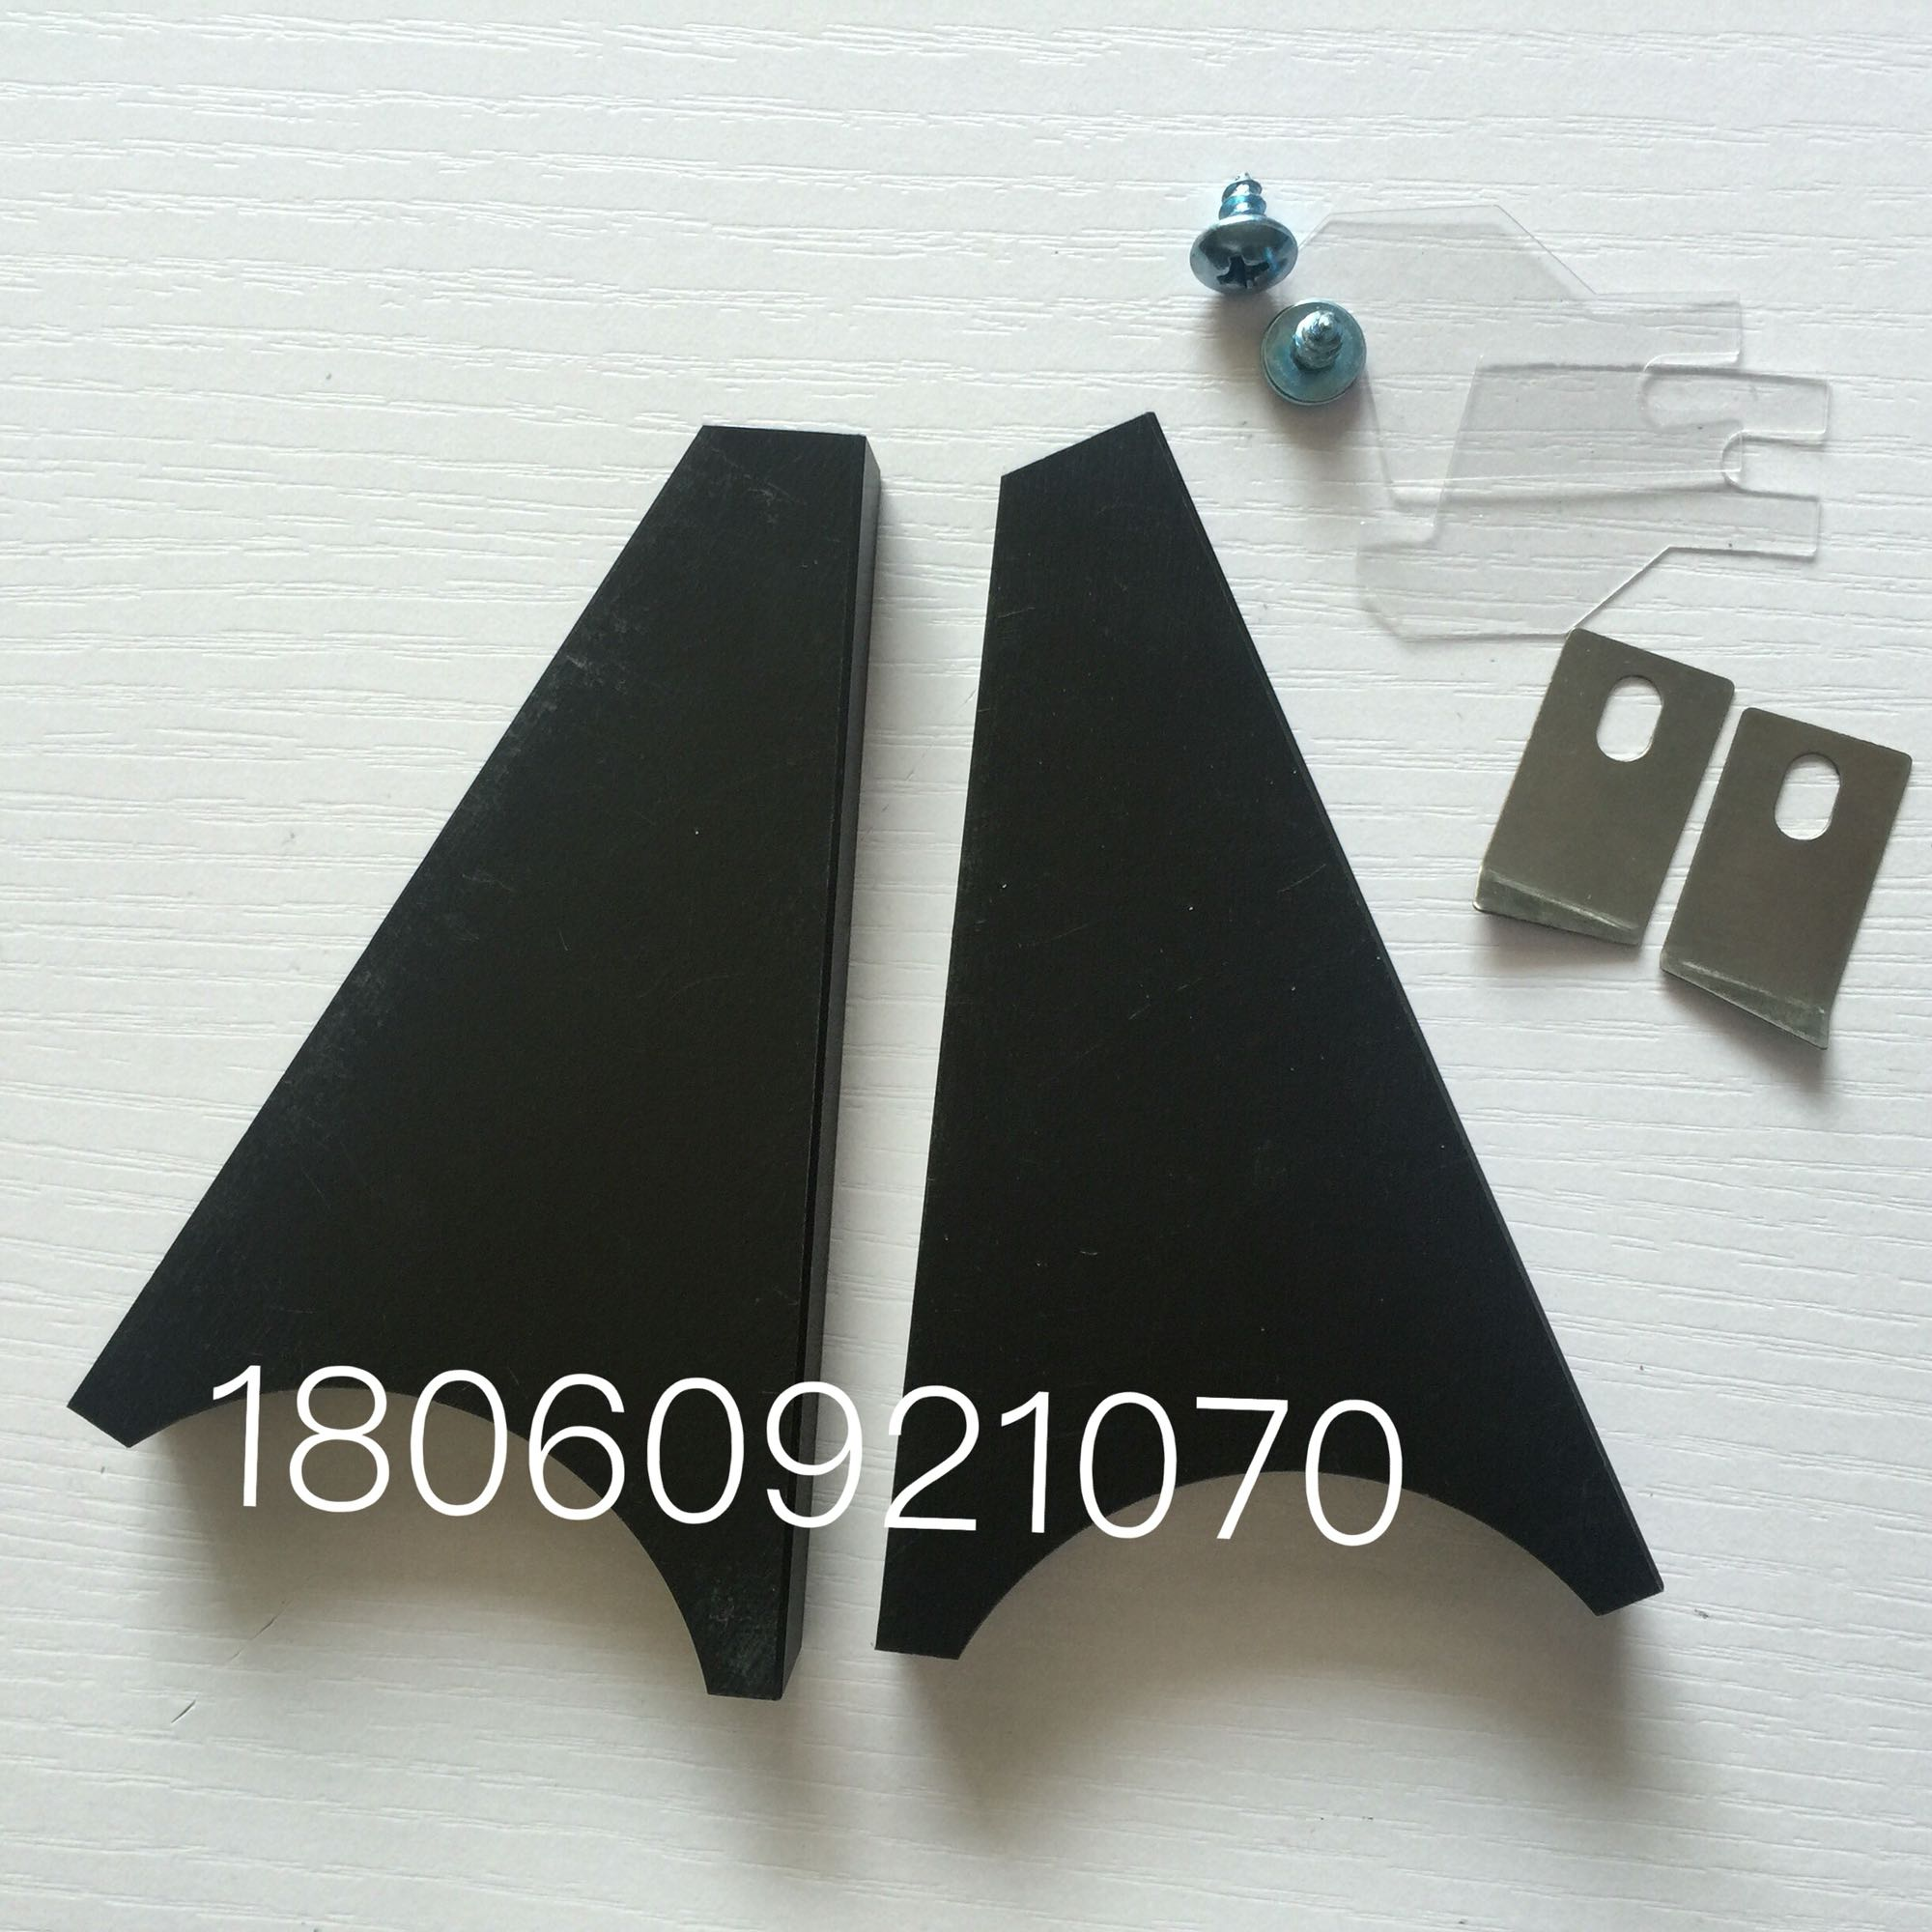 1 pair heidelberg printing machine gto52 plate for triangle plate<br><br>Aliexpress